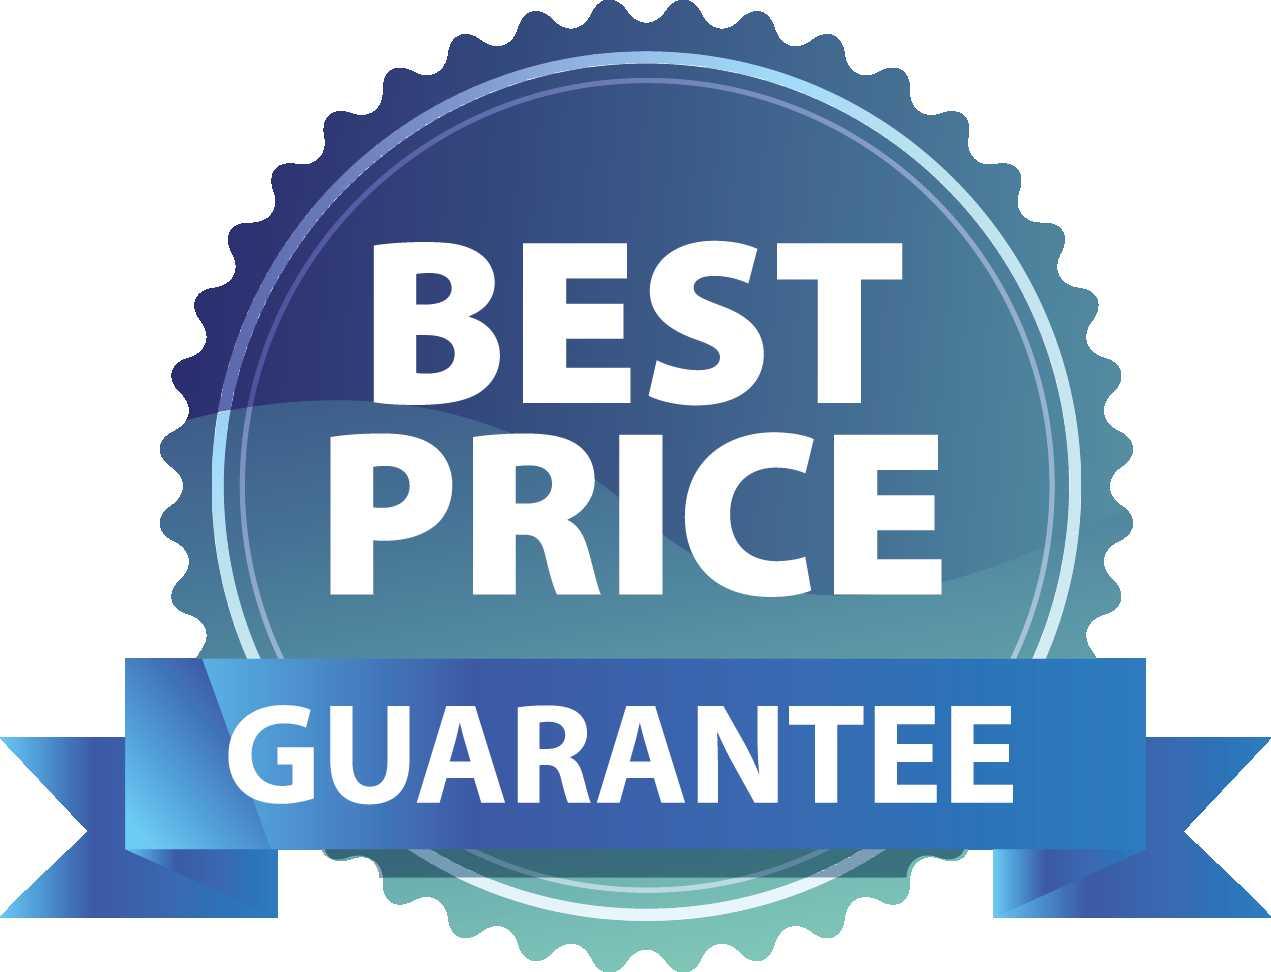 Lowest Price Guarantee  EnviroGuard Pest Control